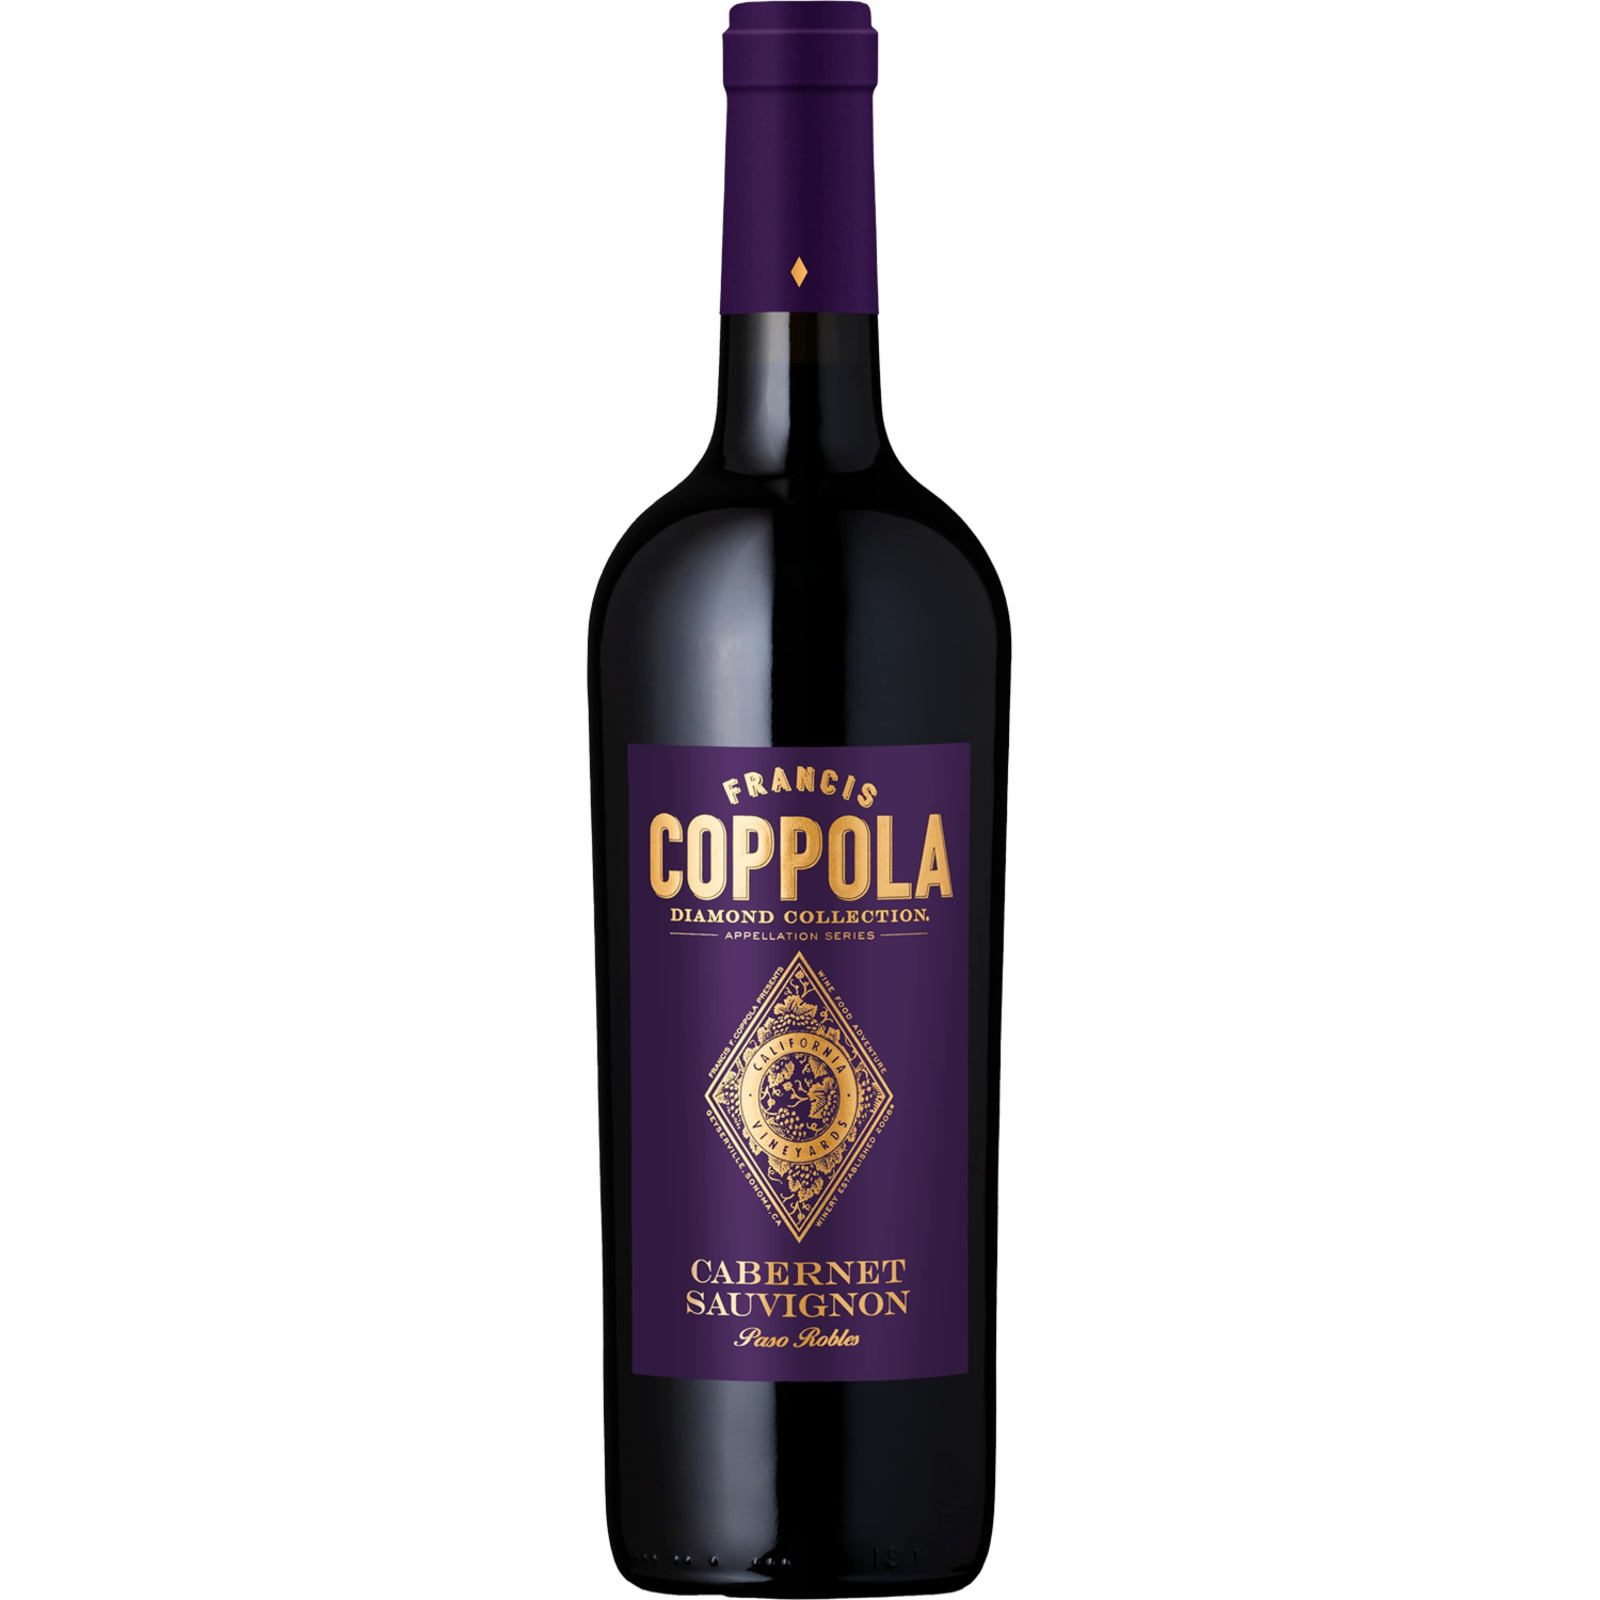 Francis Ford Coppola Winery Francis Coppola Cabernet Sauvignon Paso Robles Diamond Collection 2019